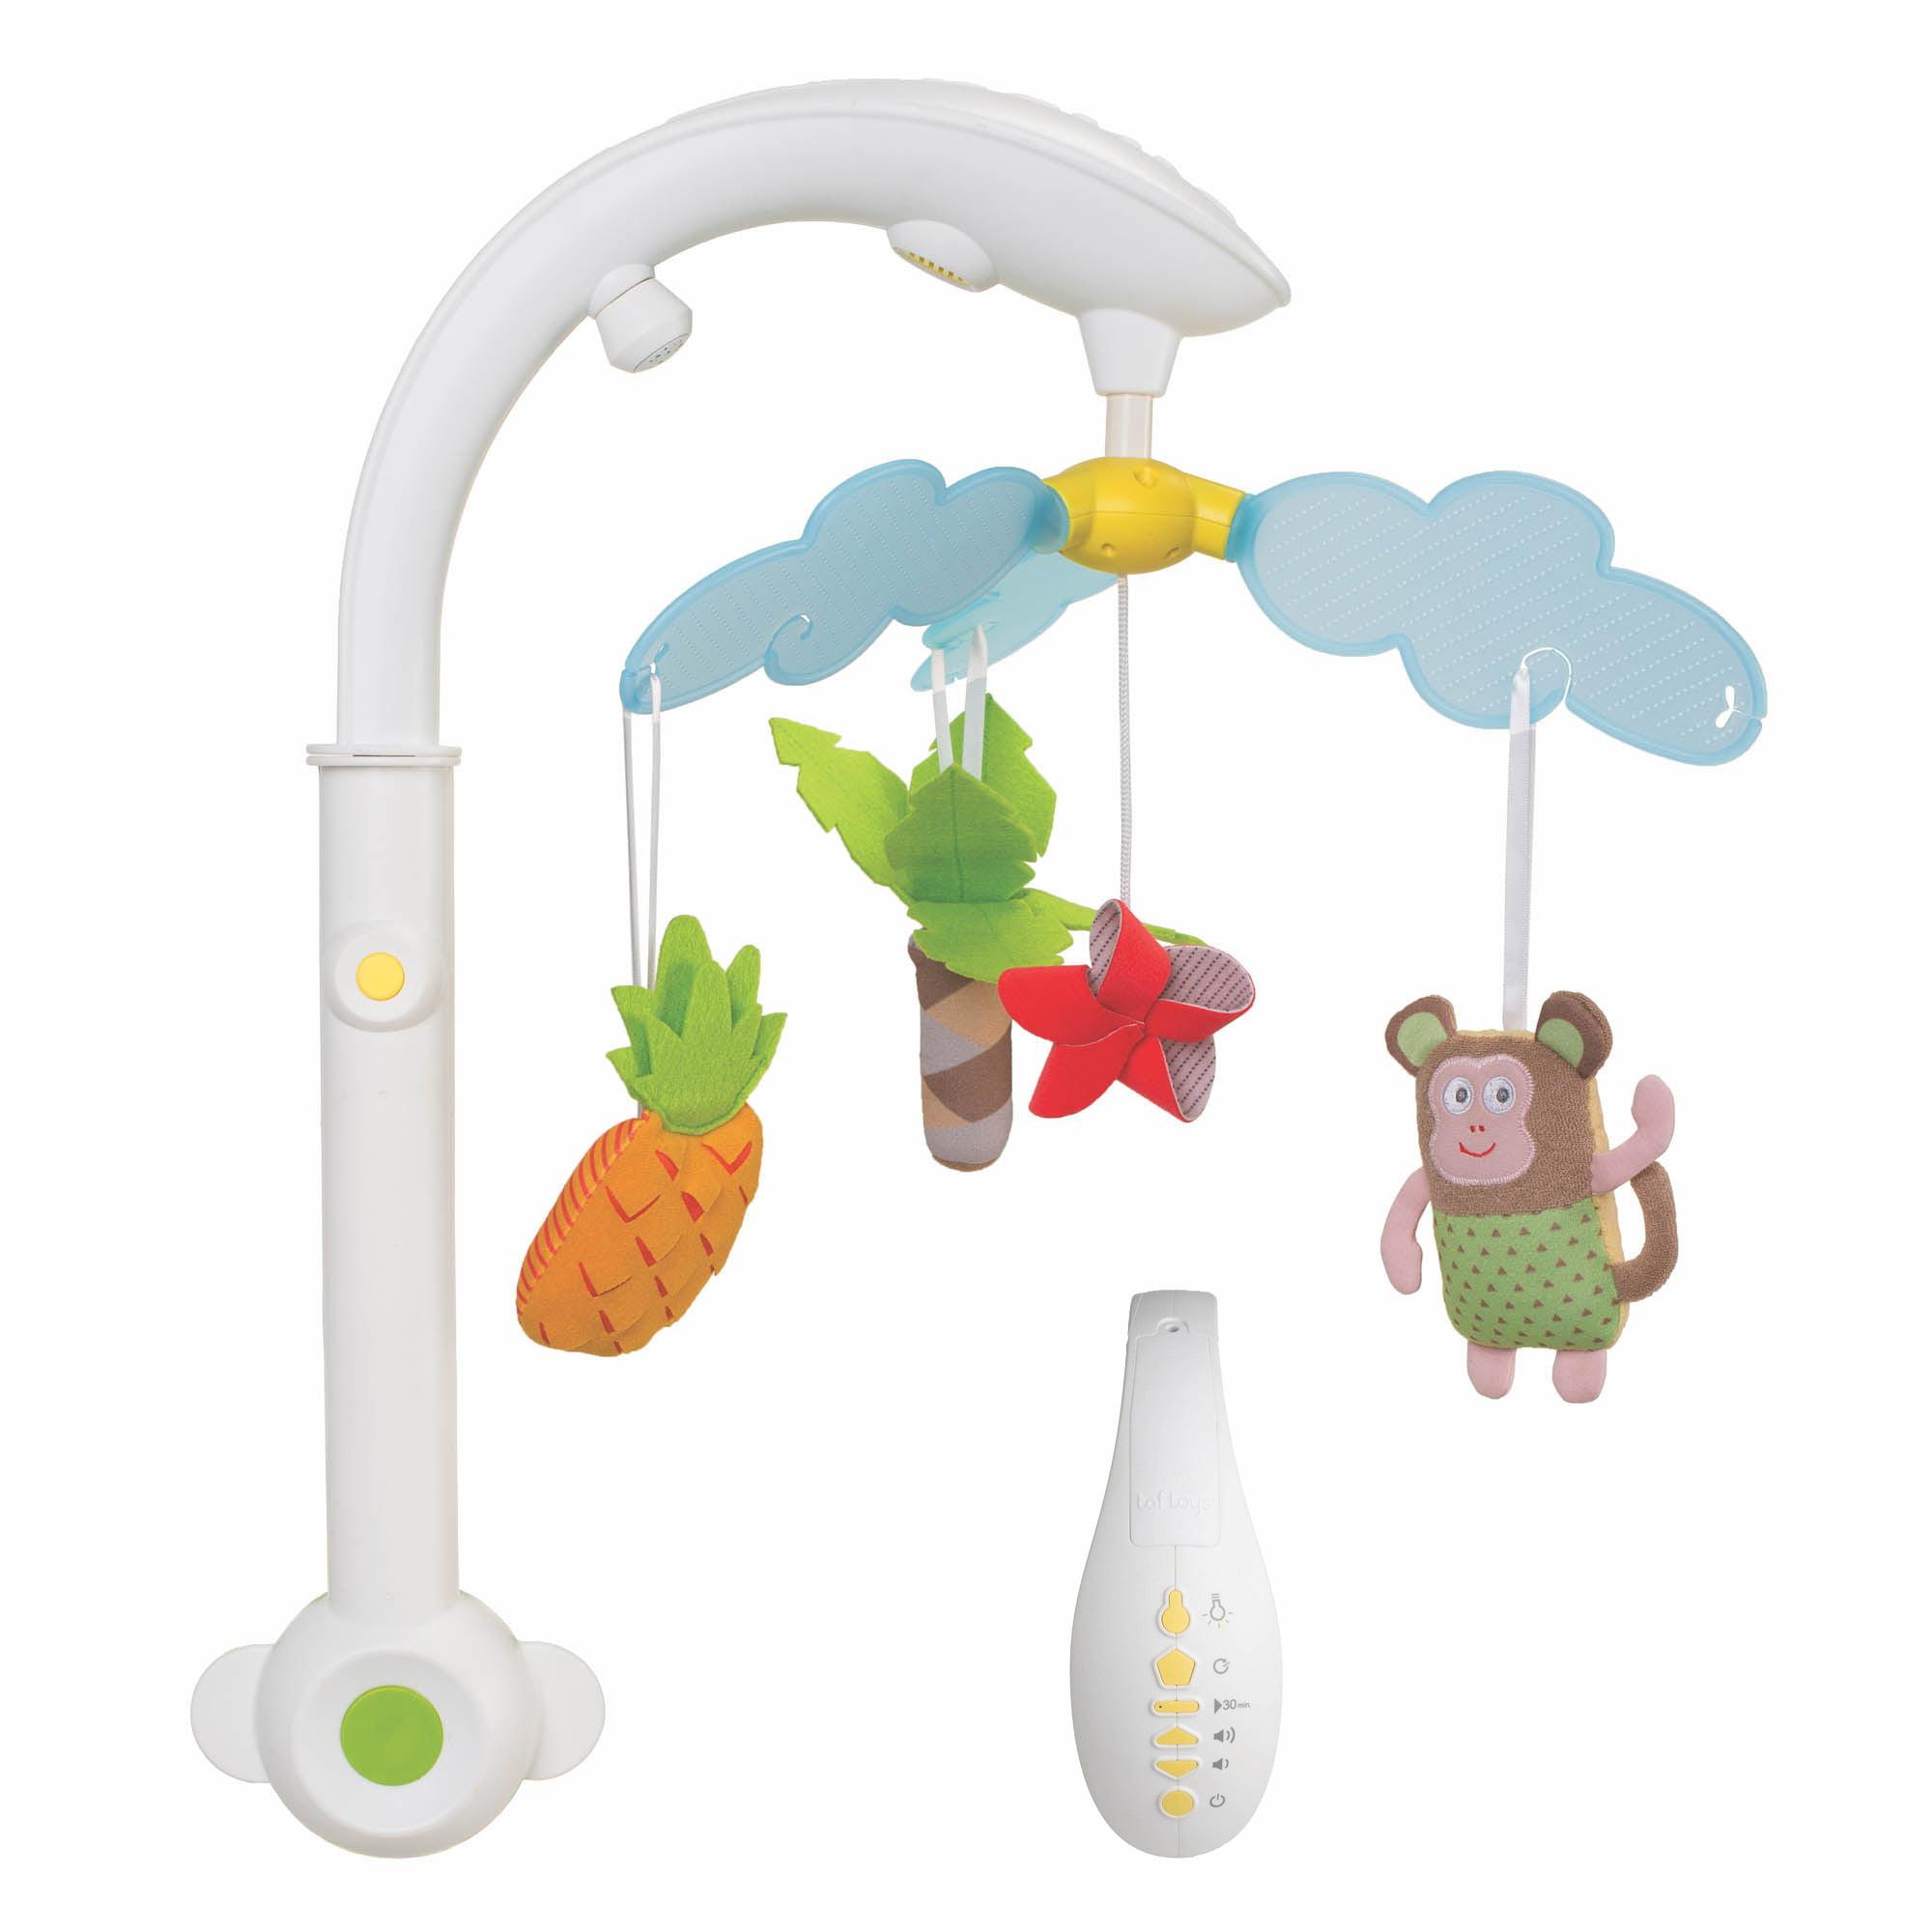 Taf Toys Tropical Mobile by Taf Toys